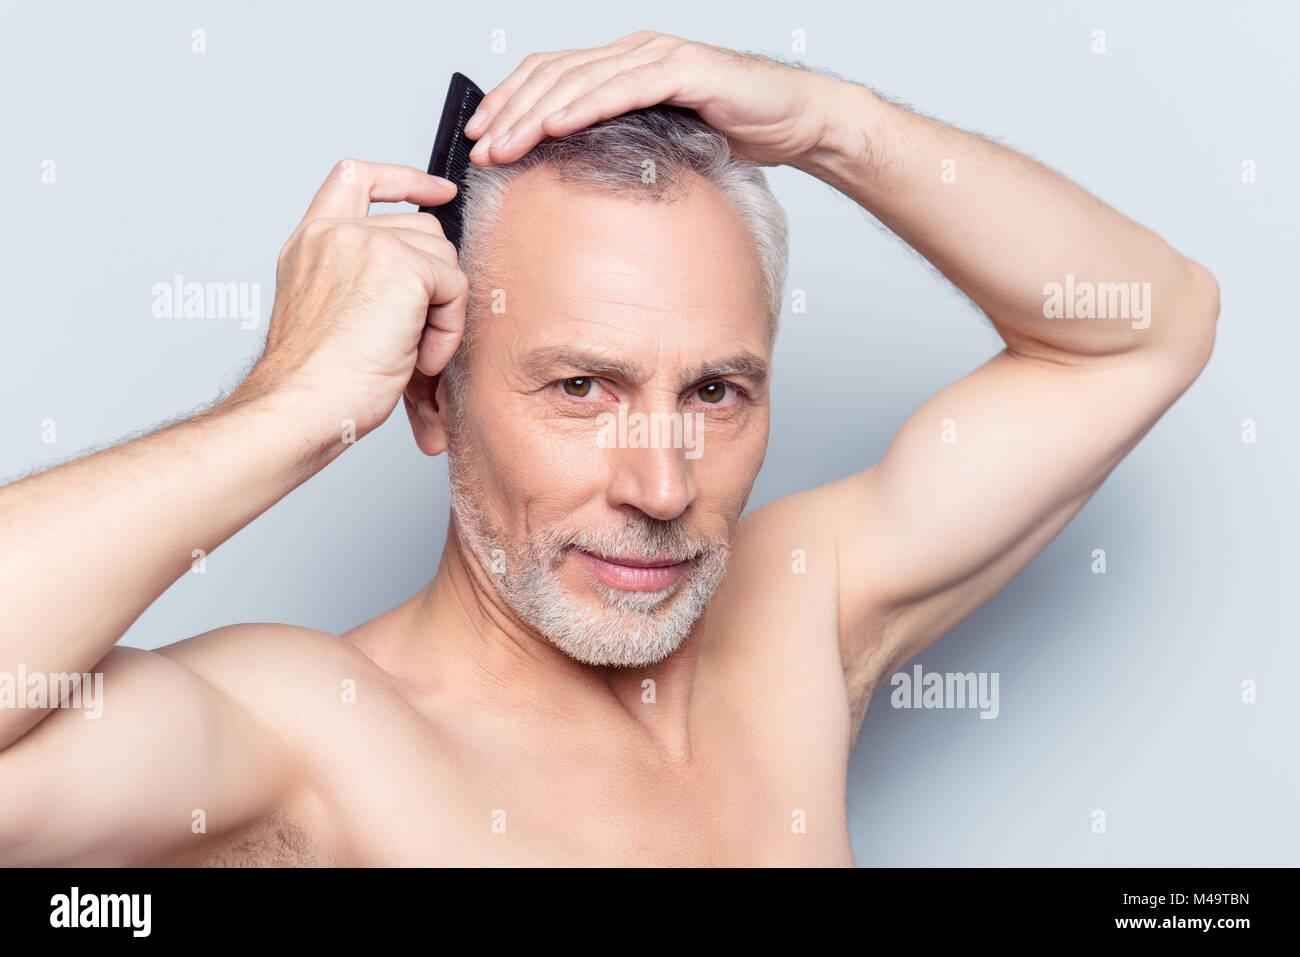 Menschen Mode Friseur Trend Konzept Close Up Portrait Von